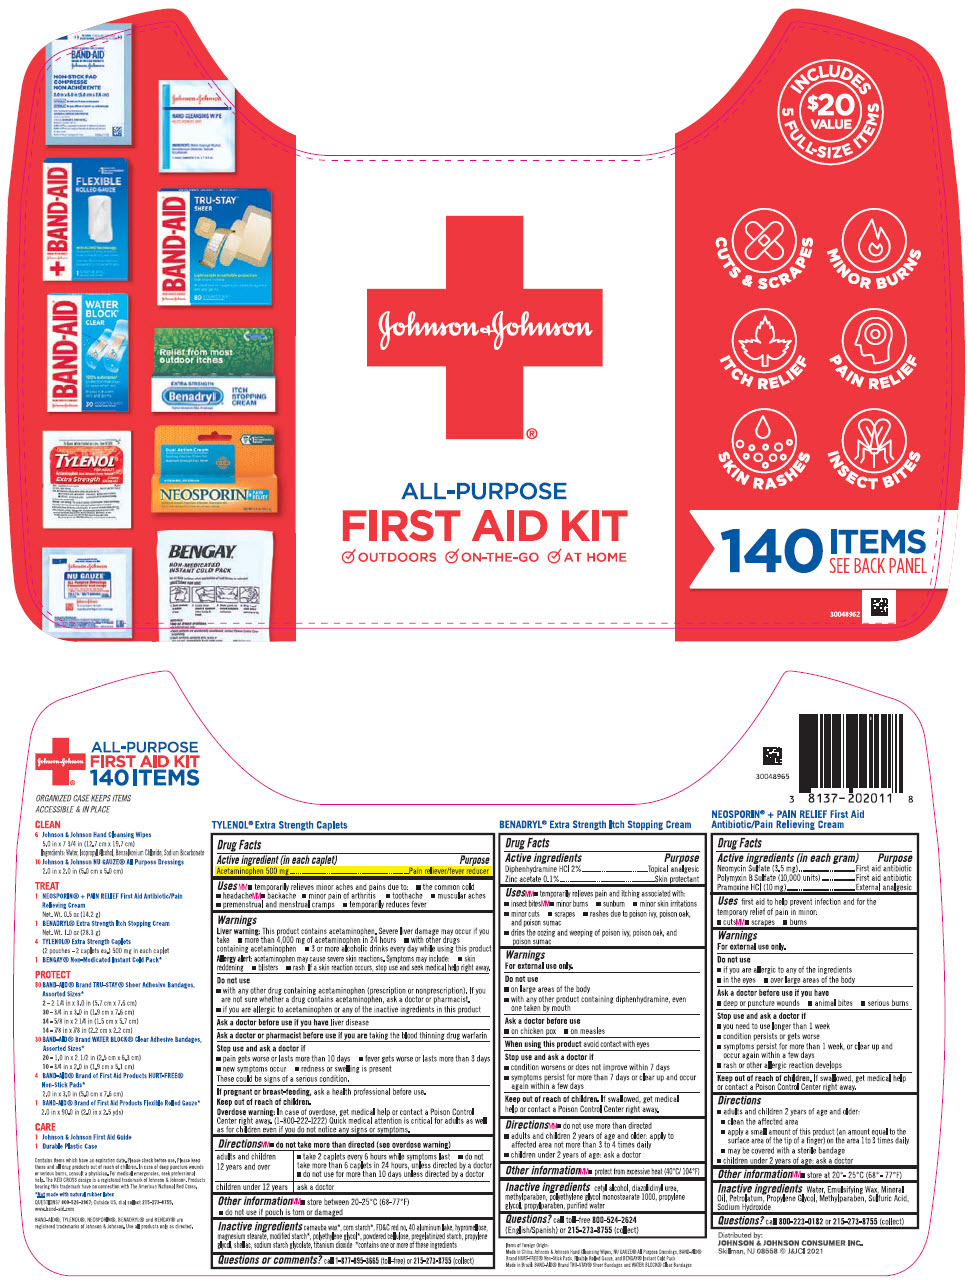 PRINCIPAL DISPLAY PANEL - Kit Package Label